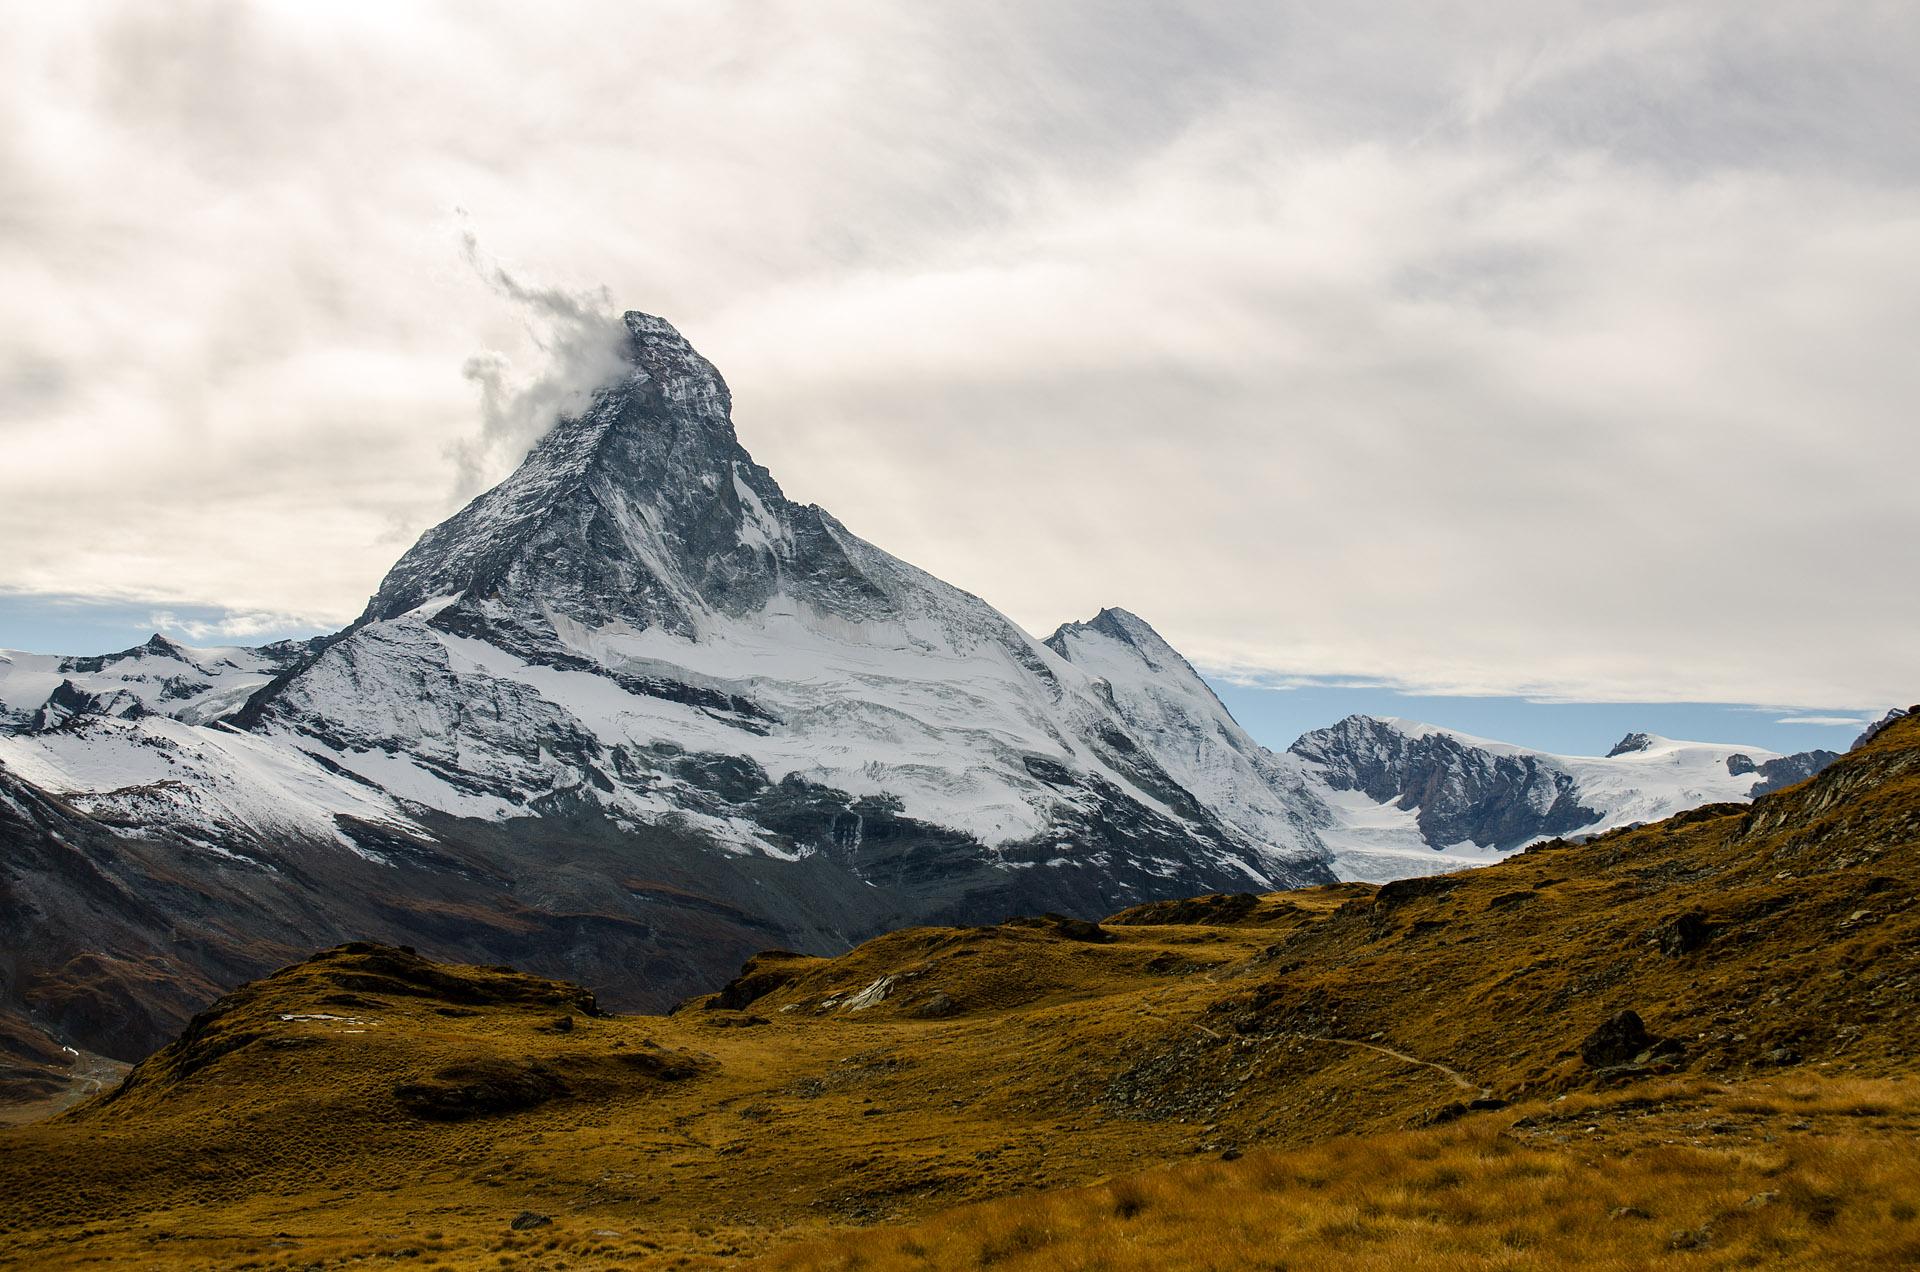 Matterhorn Glacier & Zmutt Glacier